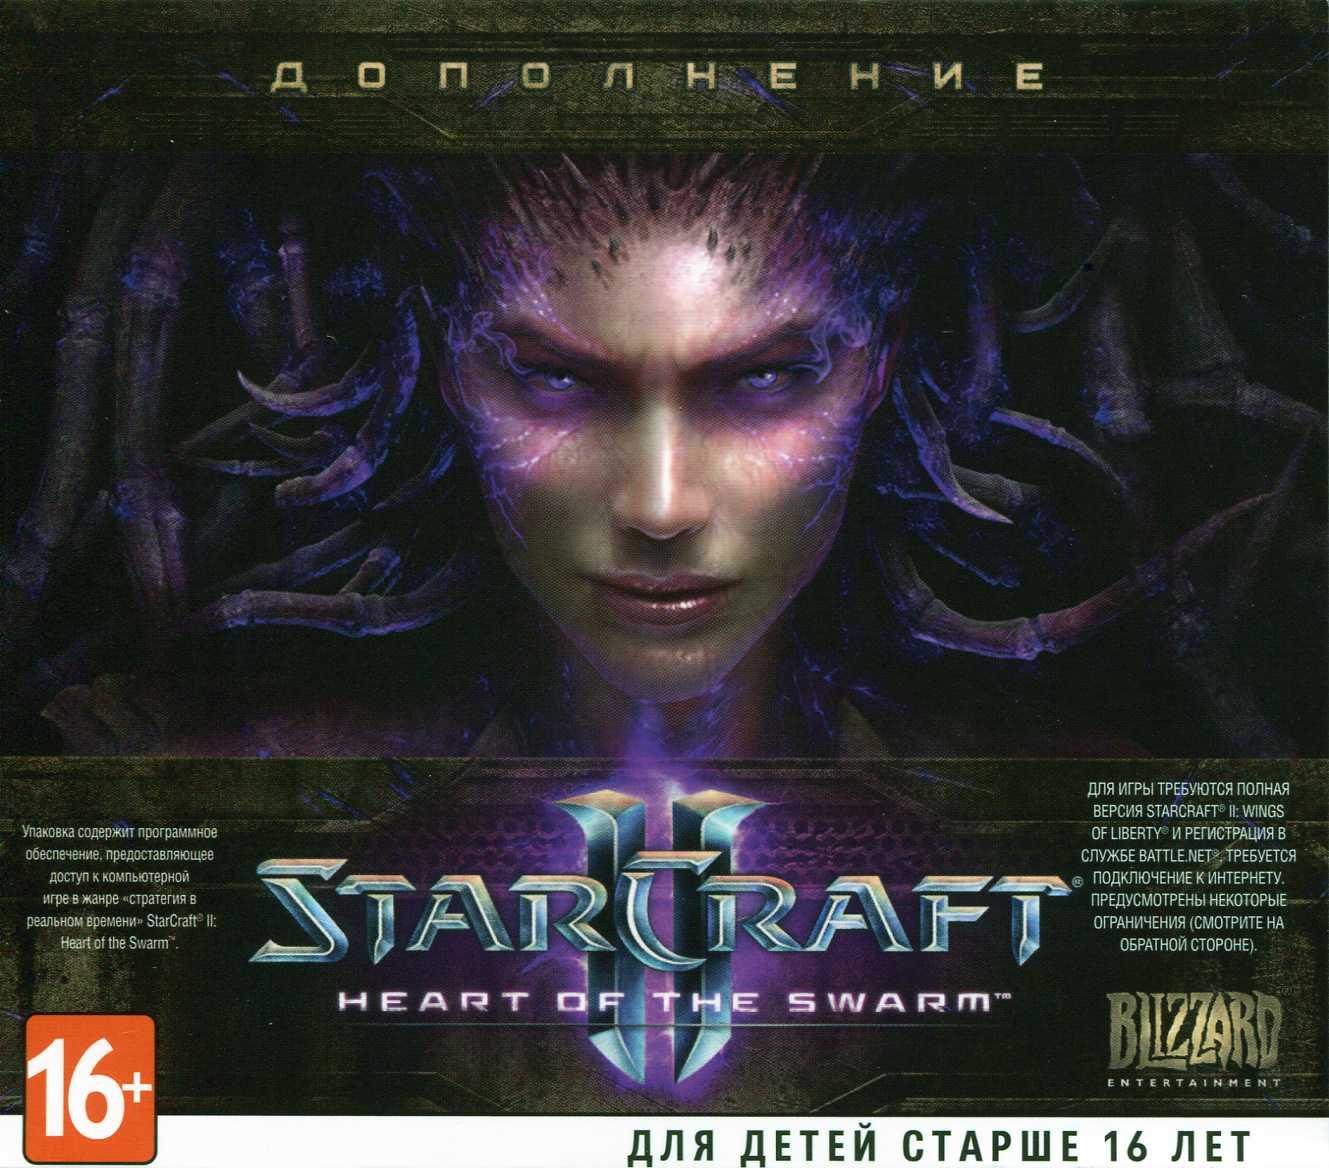 B игра StarCraft 2 Heart of the Swarm (jewel) в интернет.